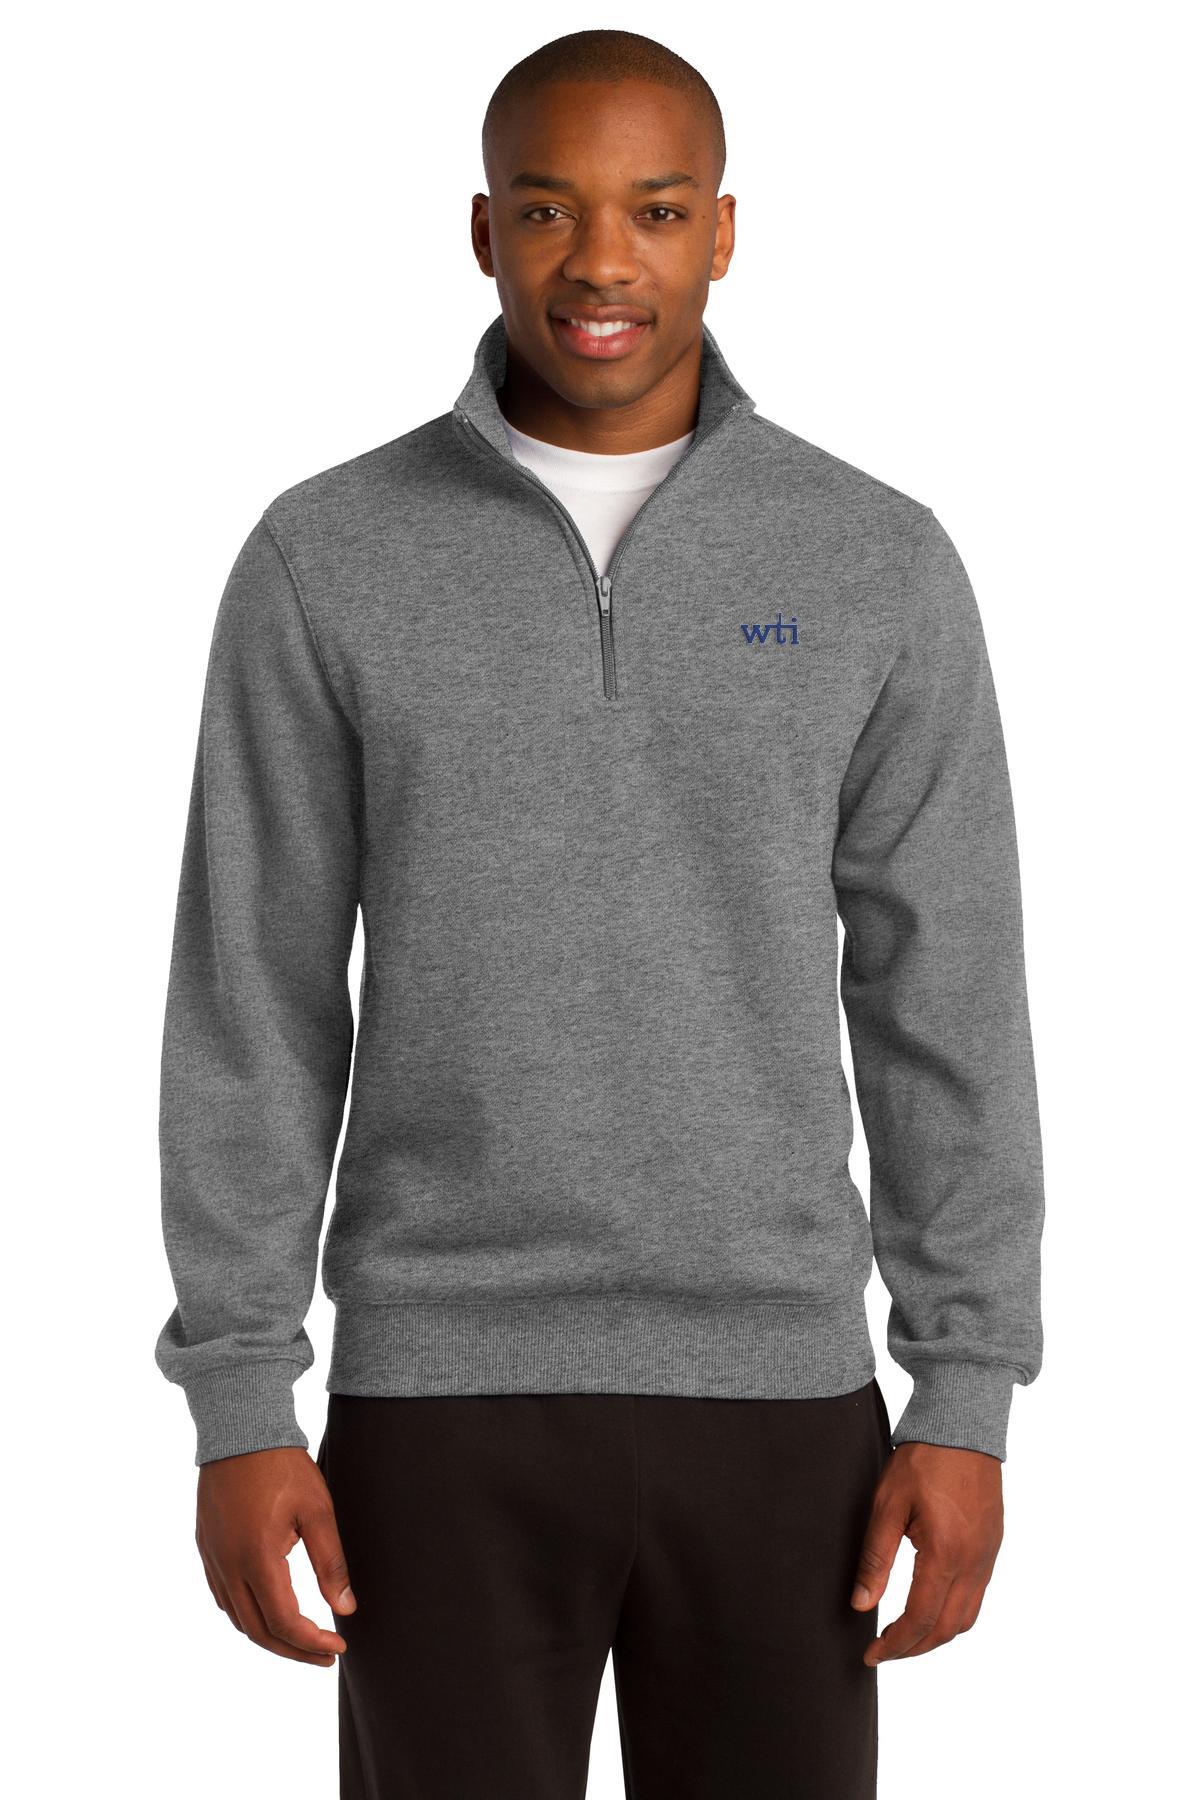 ST 1/4-Zip Sweatshirt. ST253. Prices Starting At $30!